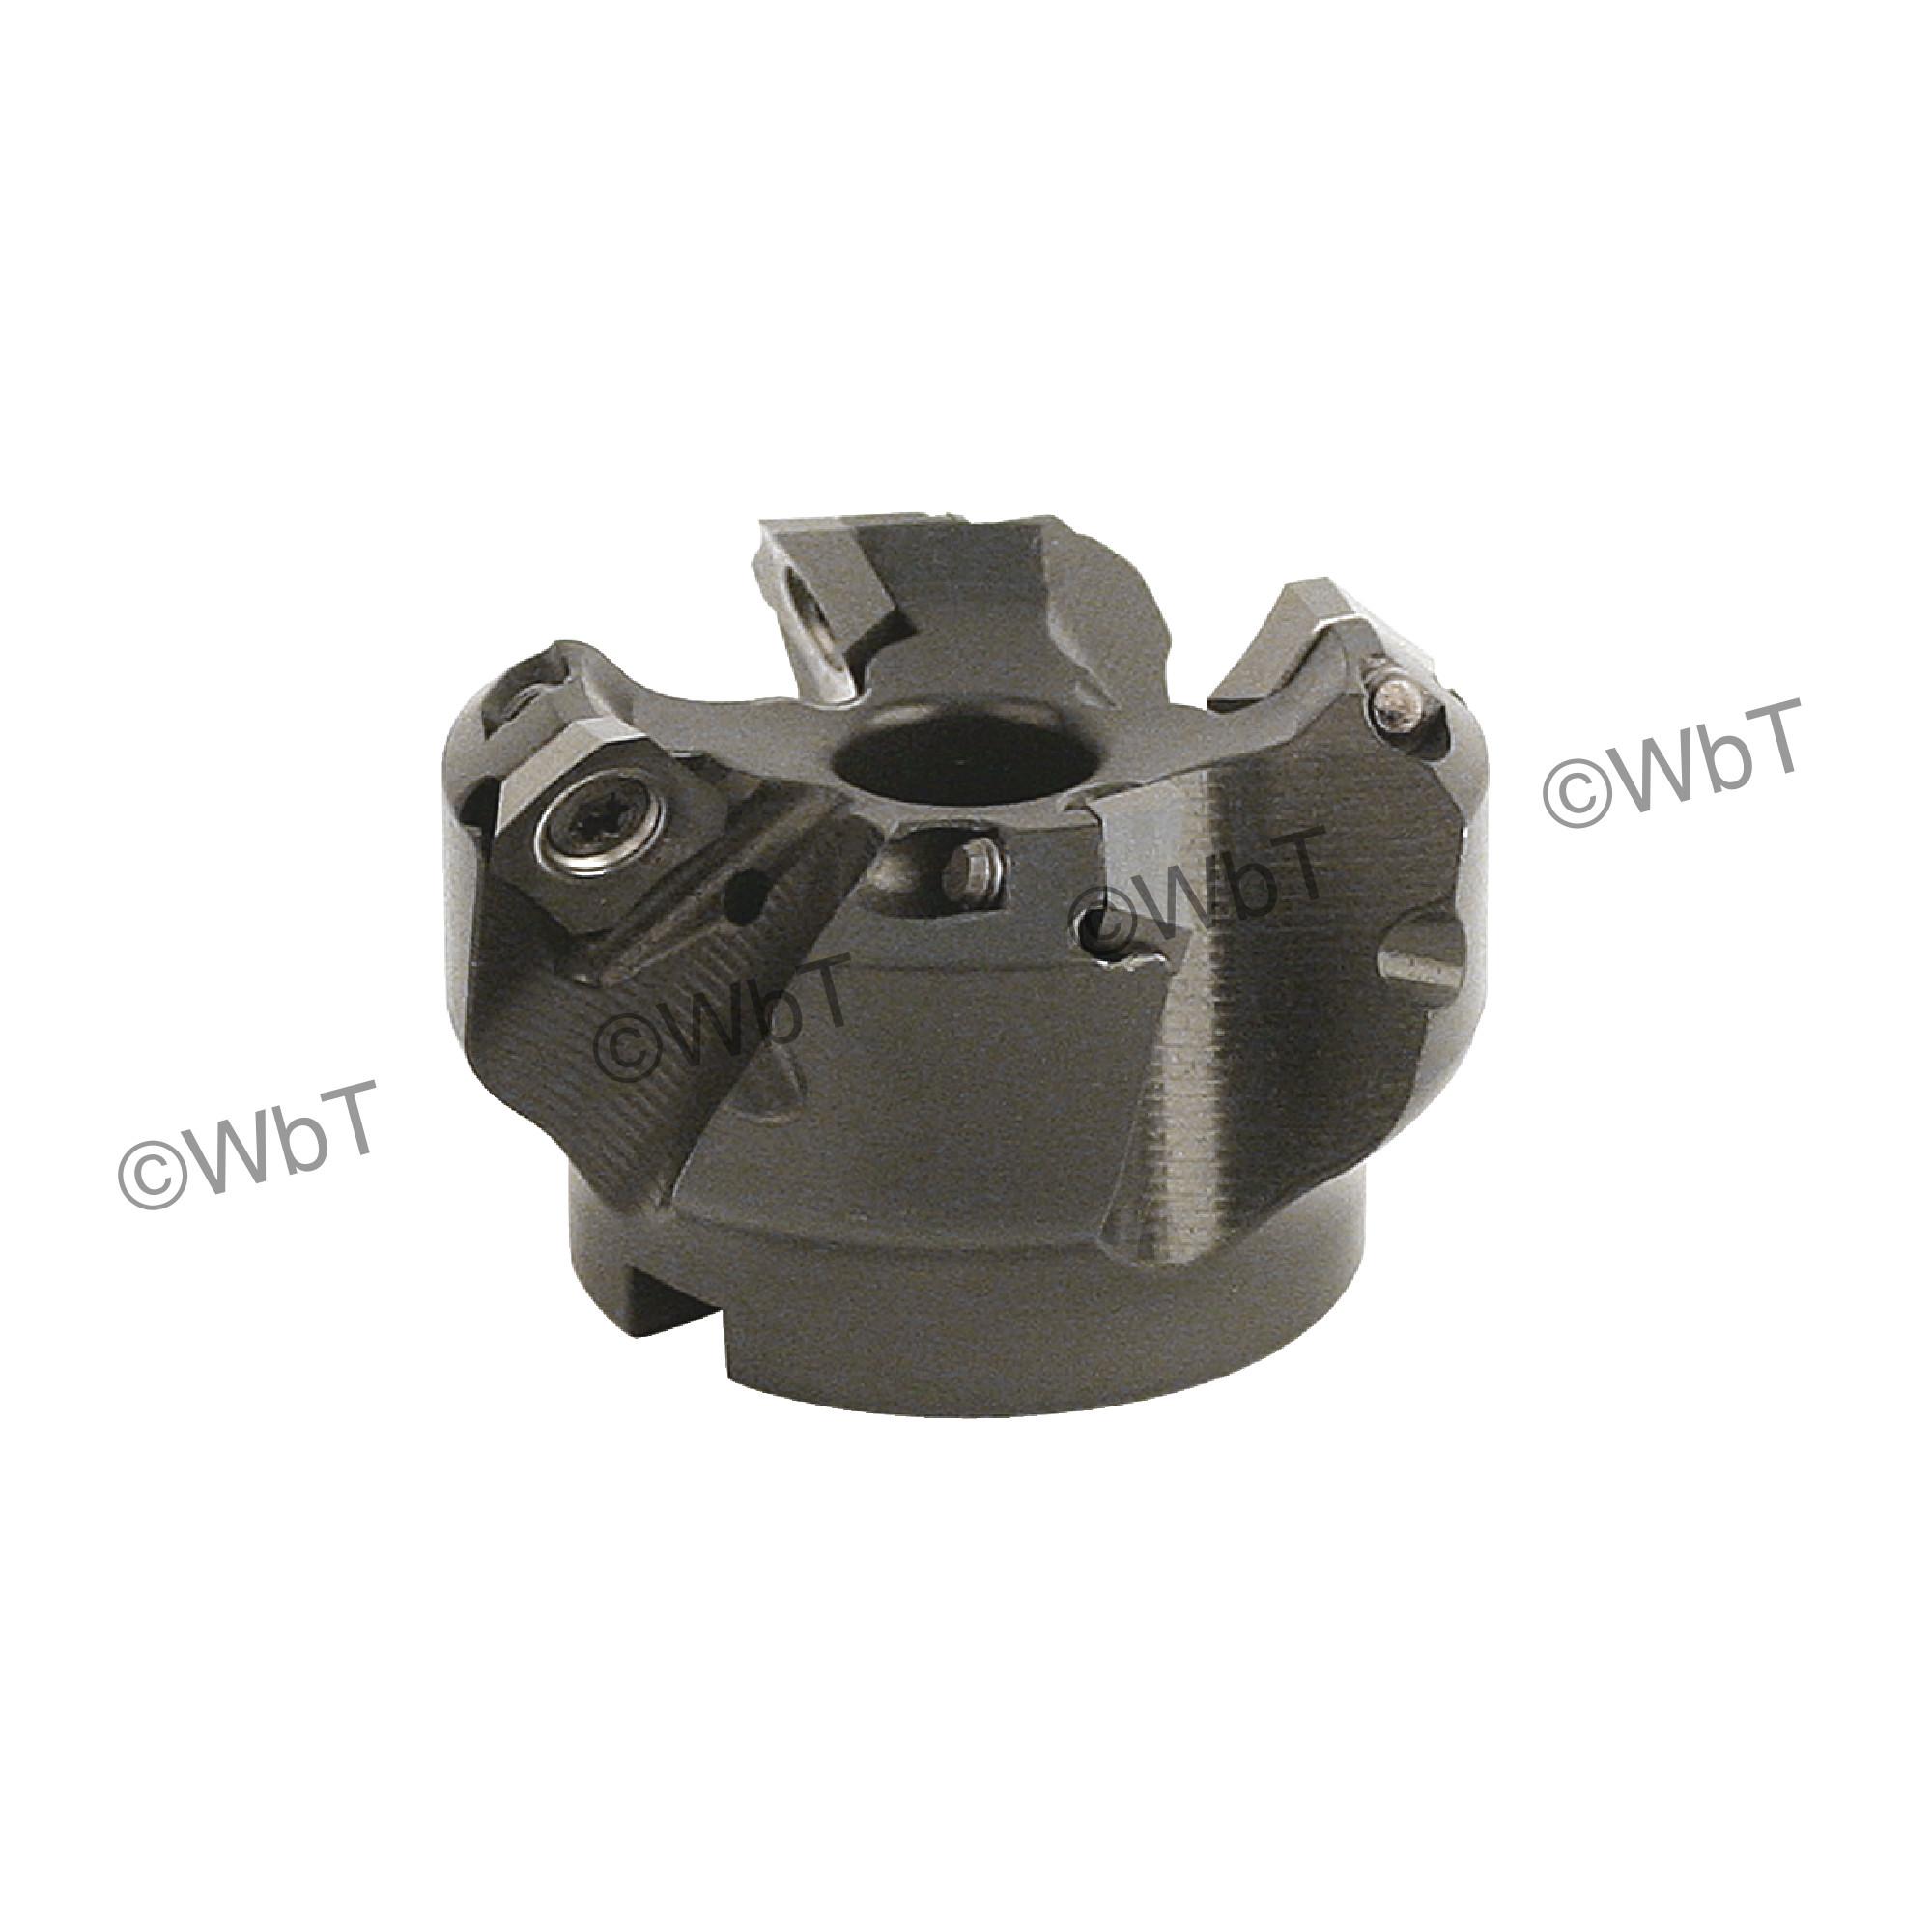 "AKUMA - 2.000"" - 45° Face Mill Set / Includes: (1) SEAC.43.200R-4 (2.0"" ø) & (10) SEHT43AFFN-N1 JM10N Polish"